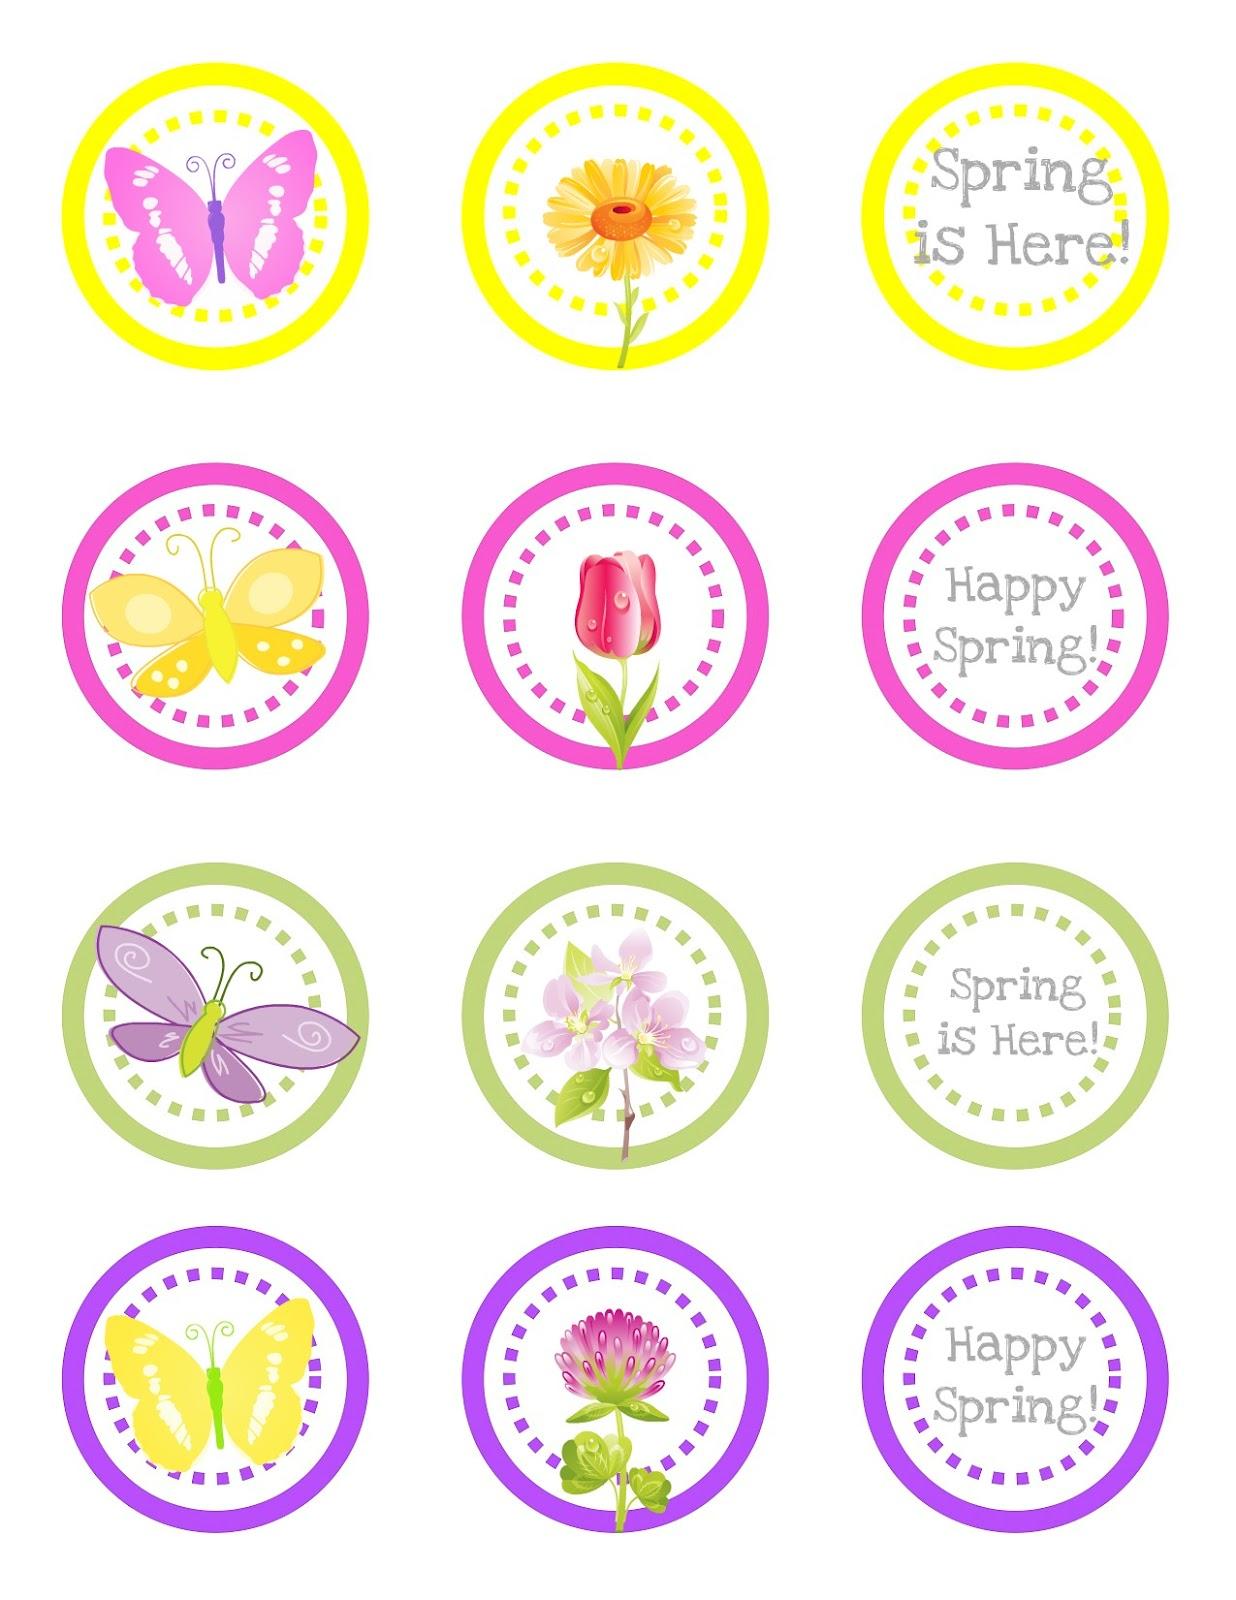 Free Printable April Showers Bring May Flowers Printable